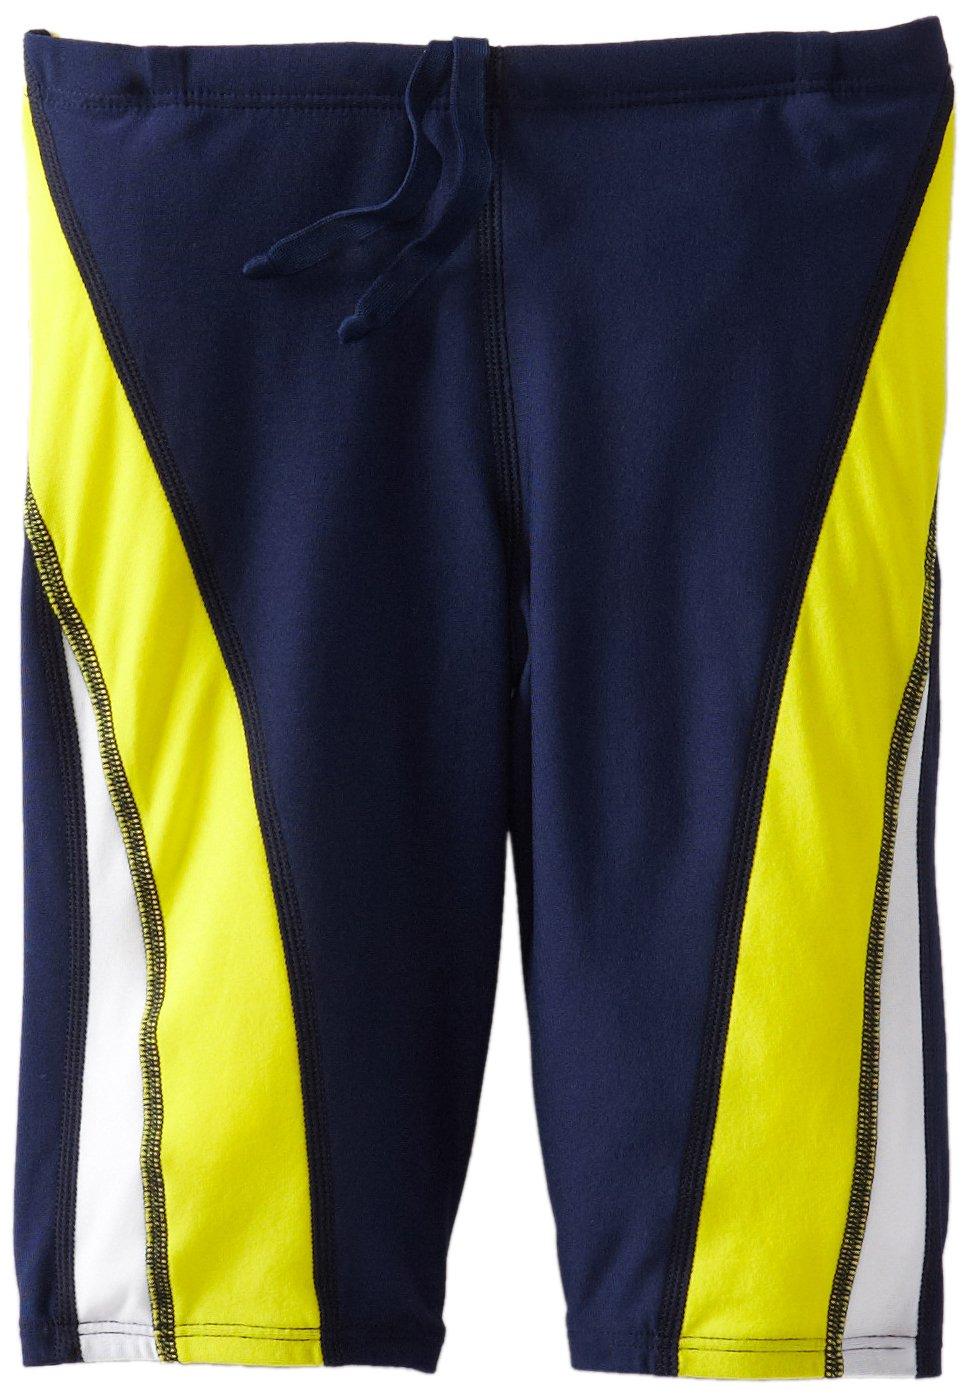 Speedo Men and Boys' Endurance+ Launch Splice Jammer Swimsuit, Navy/Gold, 22